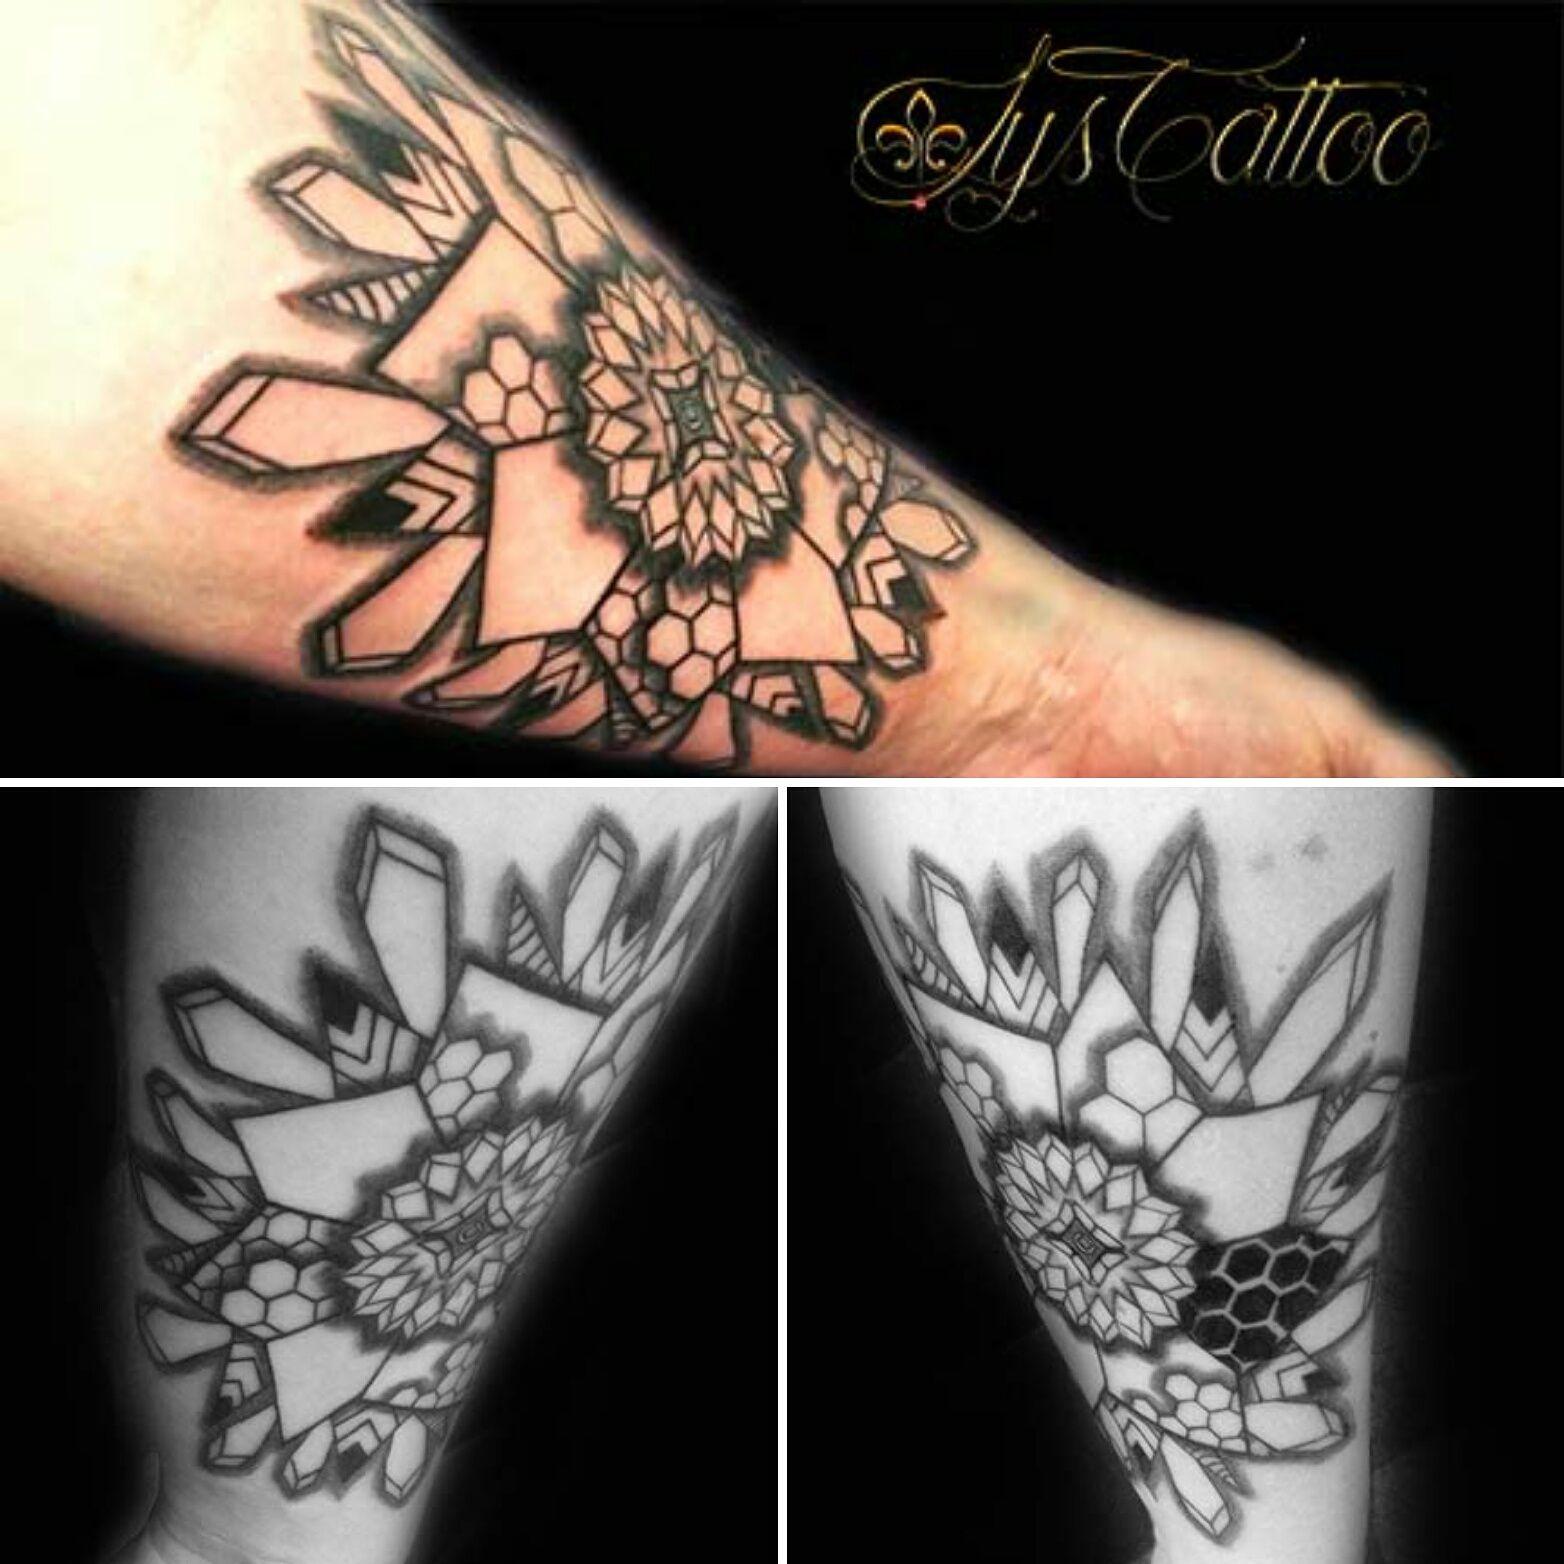 tatouage avant bras homme mandala rosace sym trie. Black Bedroom Furniture Sets. Home Design Ideas